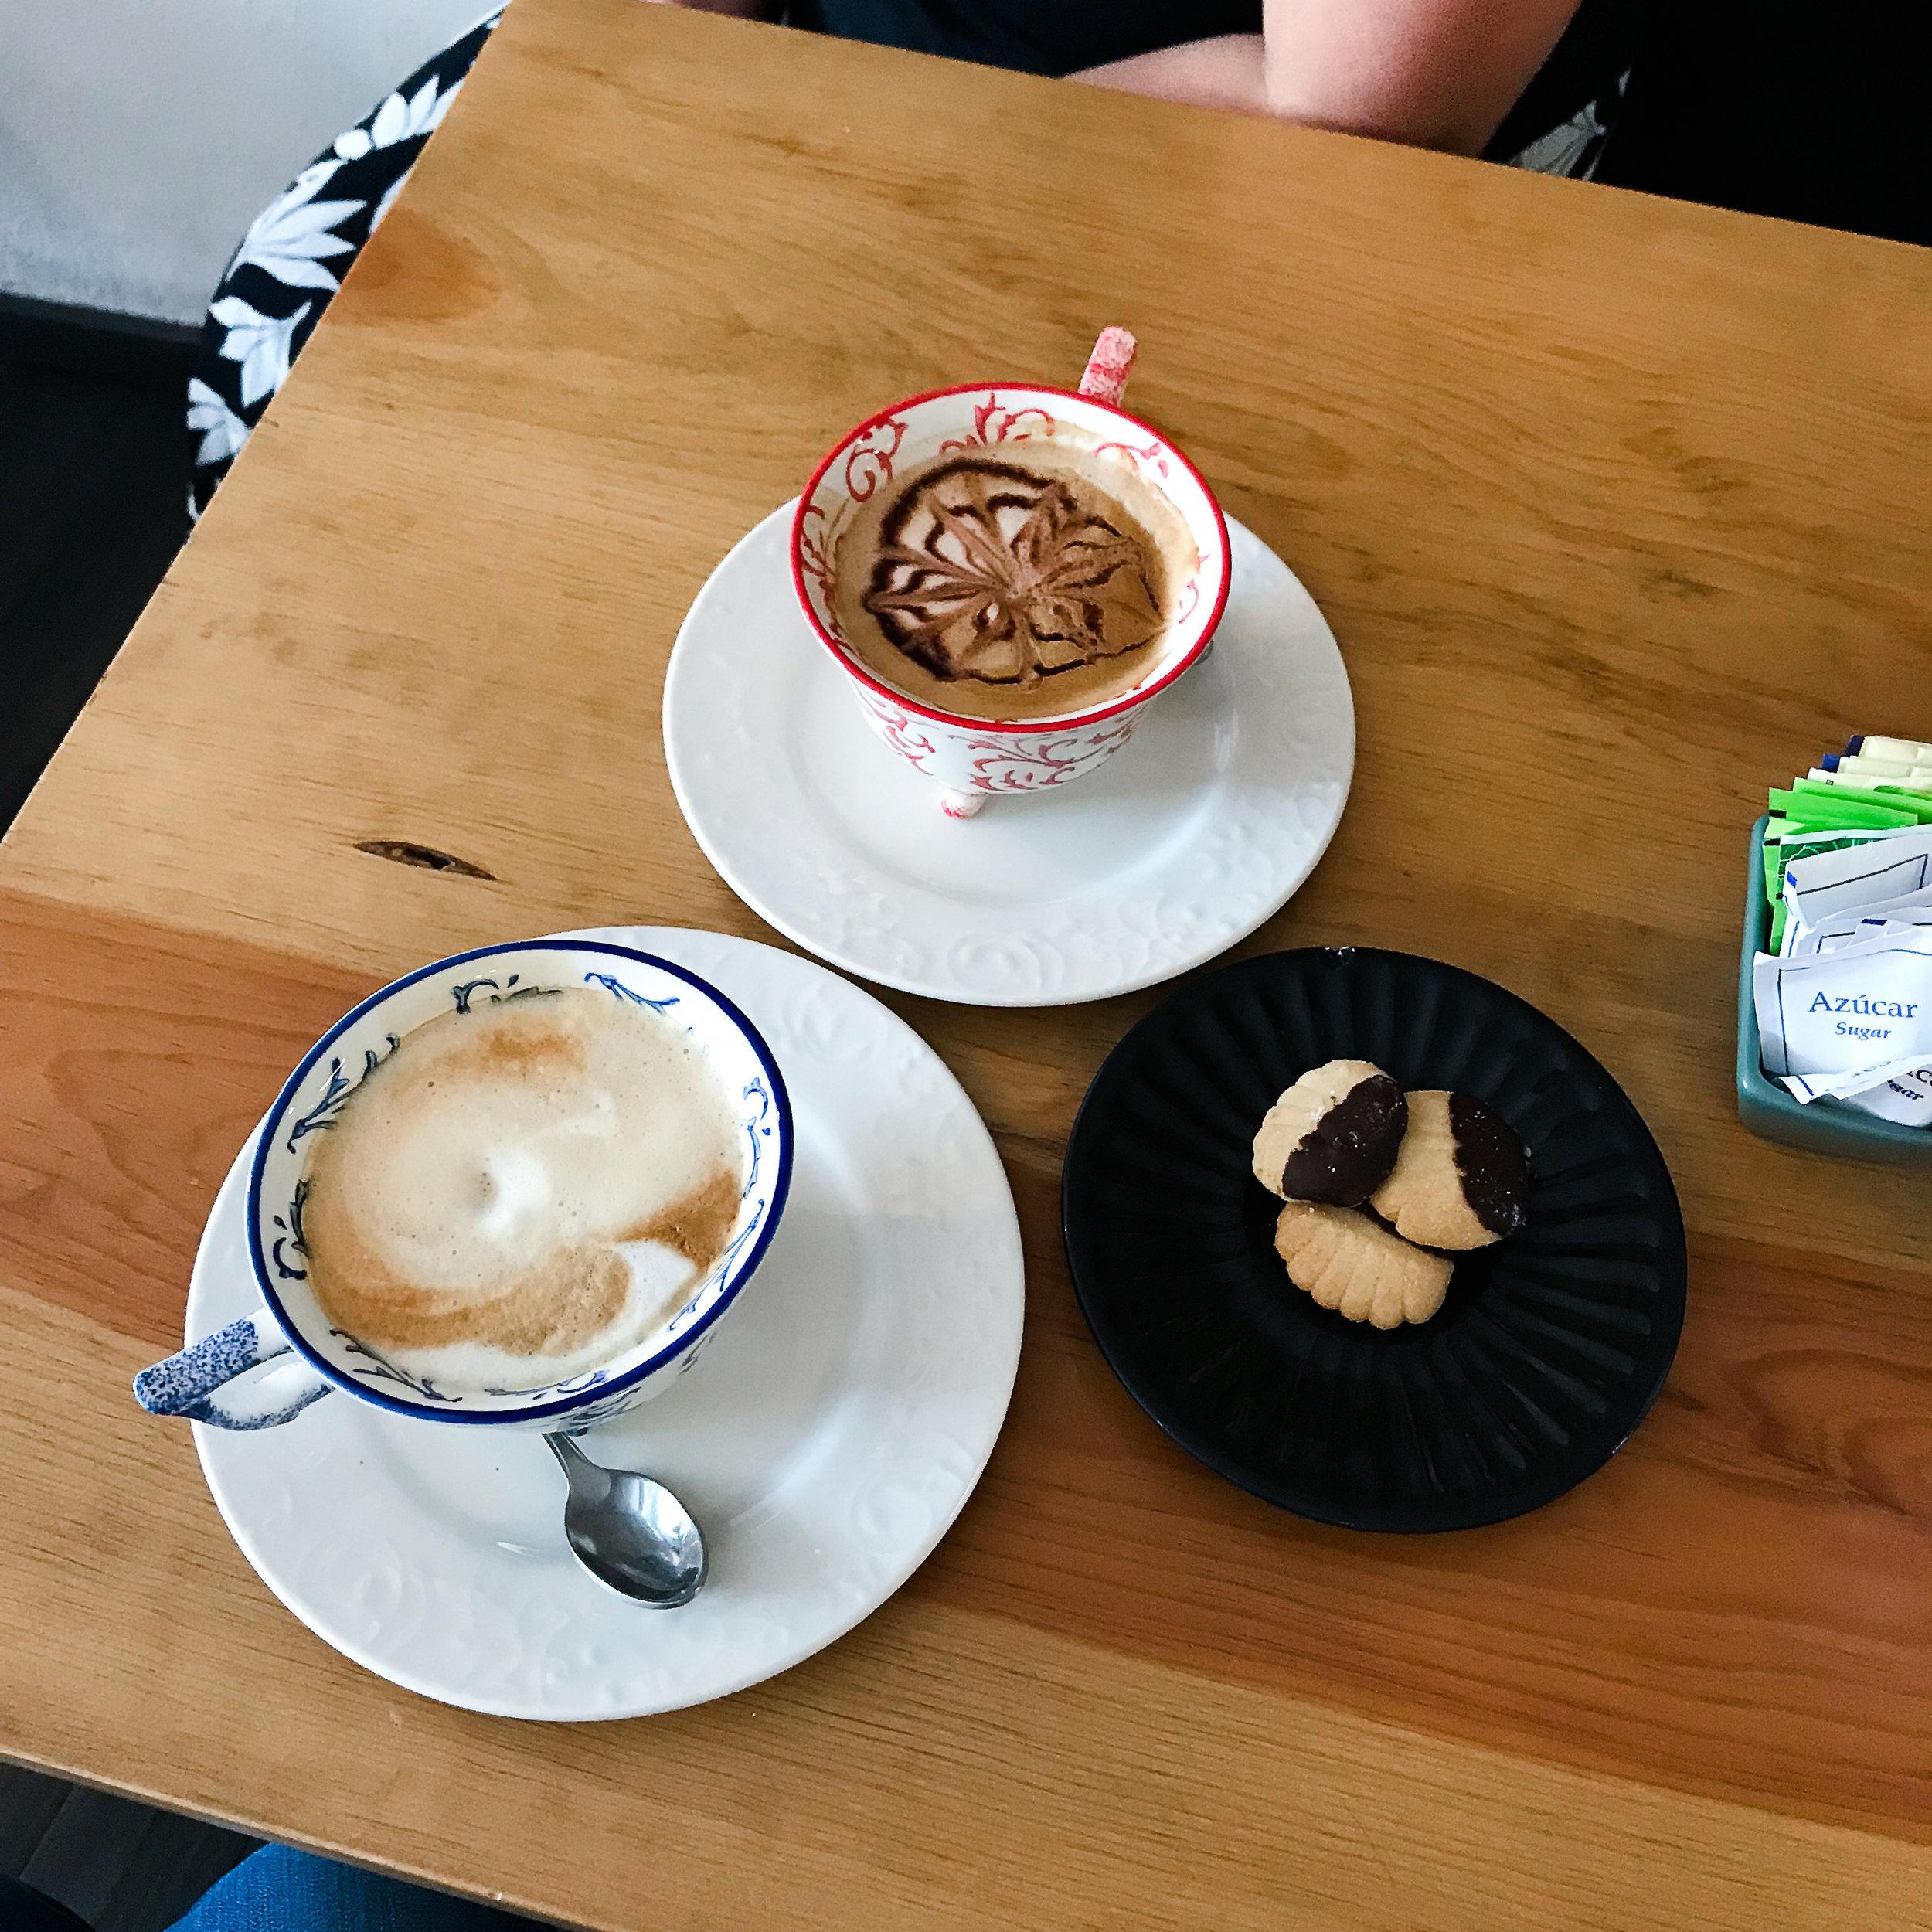 mexican-food-san-miguel-de-allende-restuarants-coffee-cafes-33.jpg